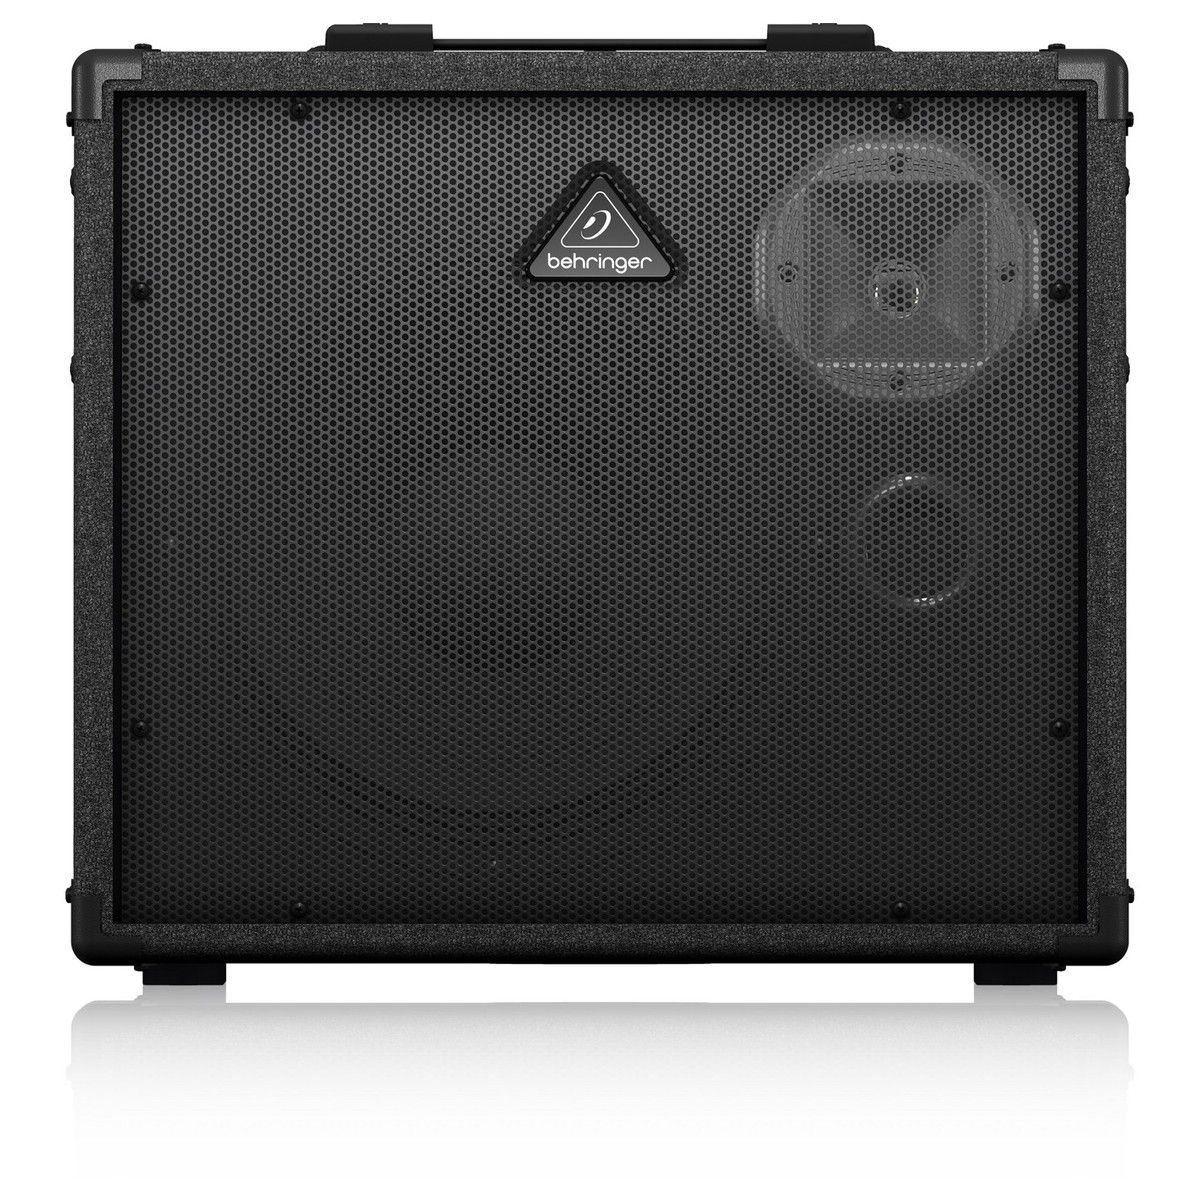 behringer k900fx ultratone keyboard amp b stock at gear4music. Black Bedroom Furniture Sets. Home Design Ideas